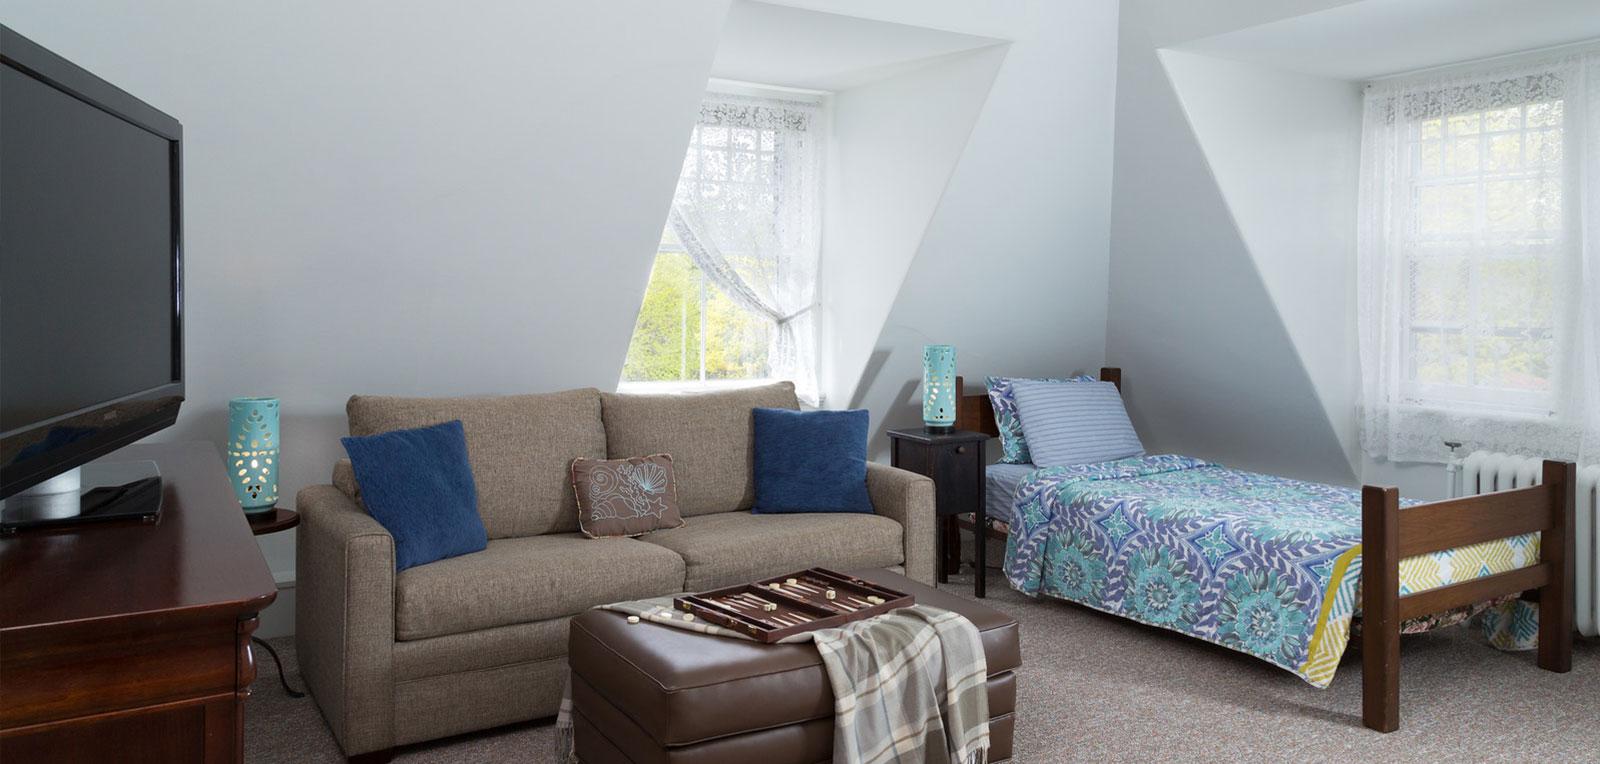 Admiral Sims' Suite Room, Sofa and TV | ADMIRAL SIMS B&B, Newport Rhode Island